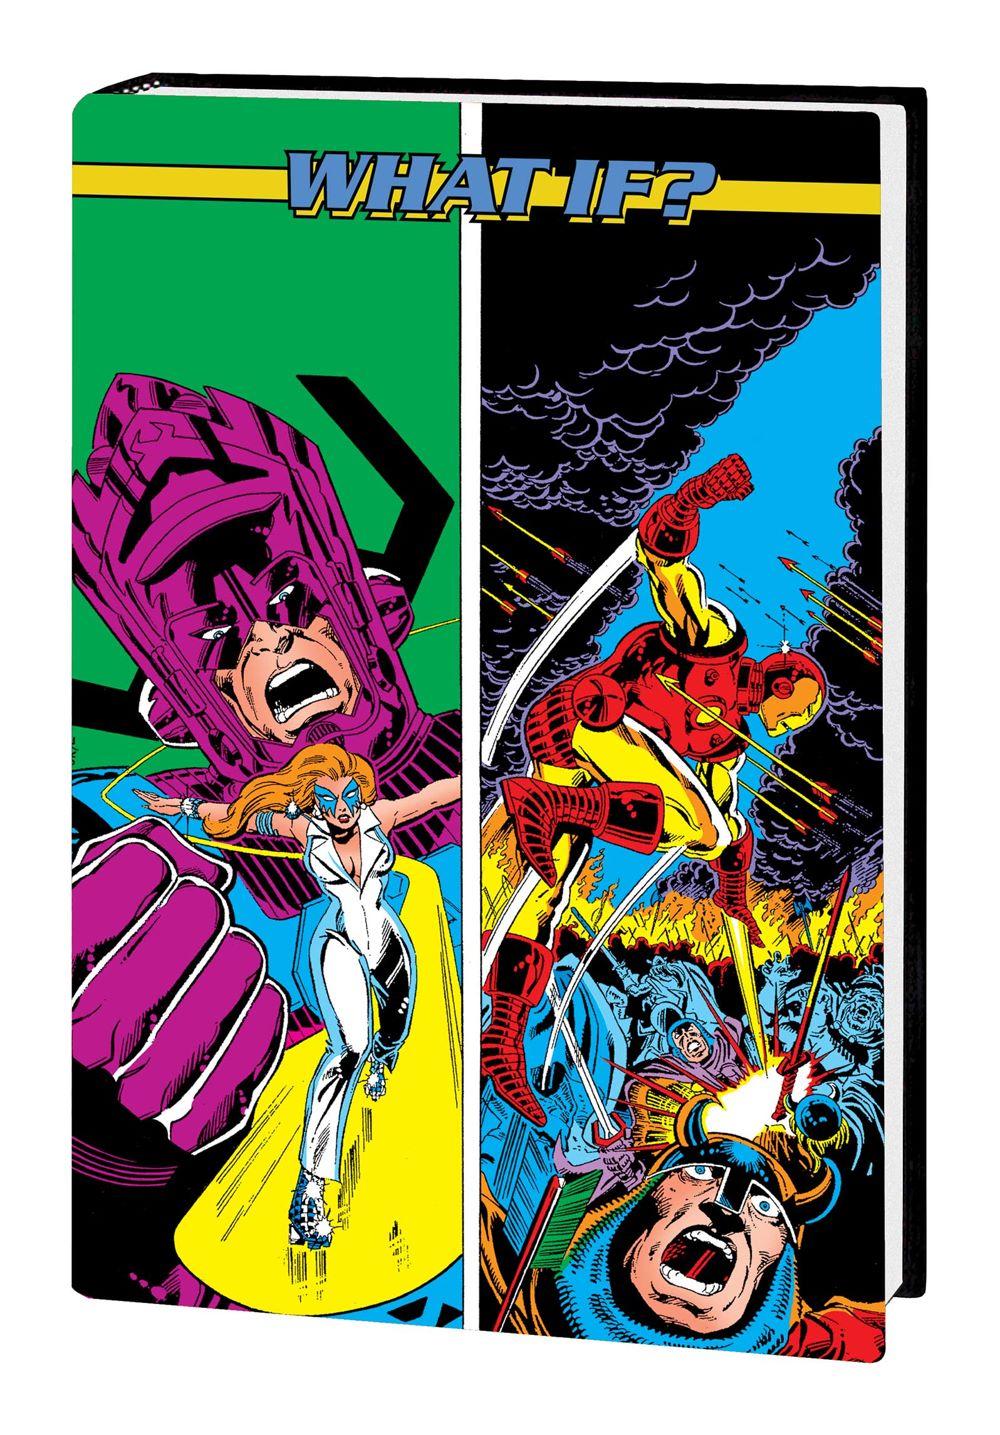 WHAOMSOMNI_V2_HC_DM_1 Marvel Comics August 2021 Solicitations